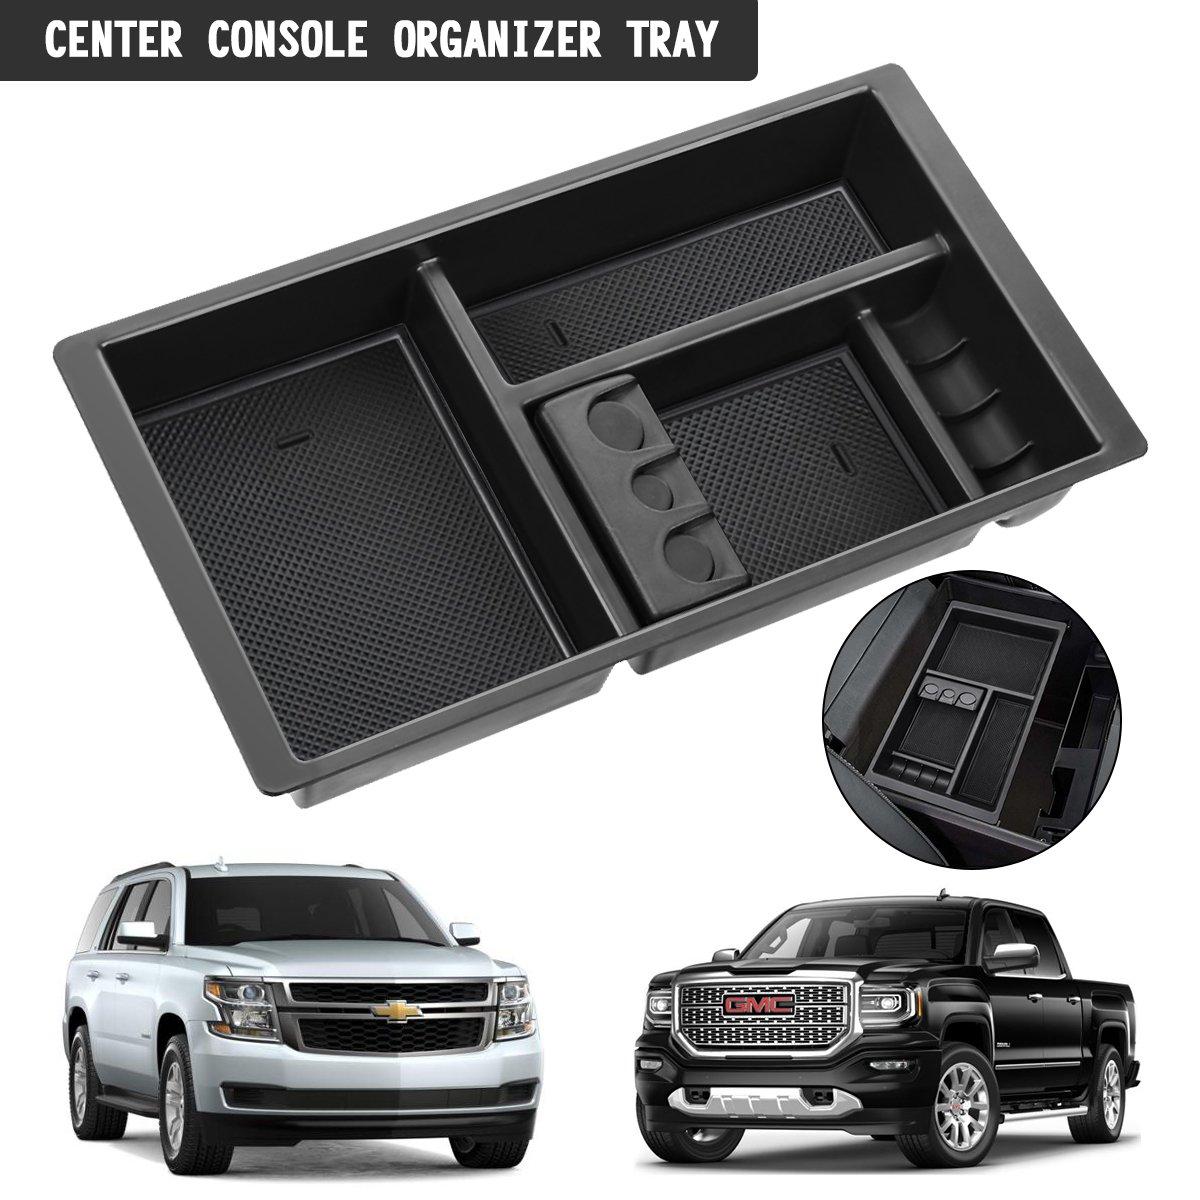 Audew Center Console Organizer Tray For Chevy Silverado Gmc Sierra 2015 Yukon 2018 Gm Vehicles